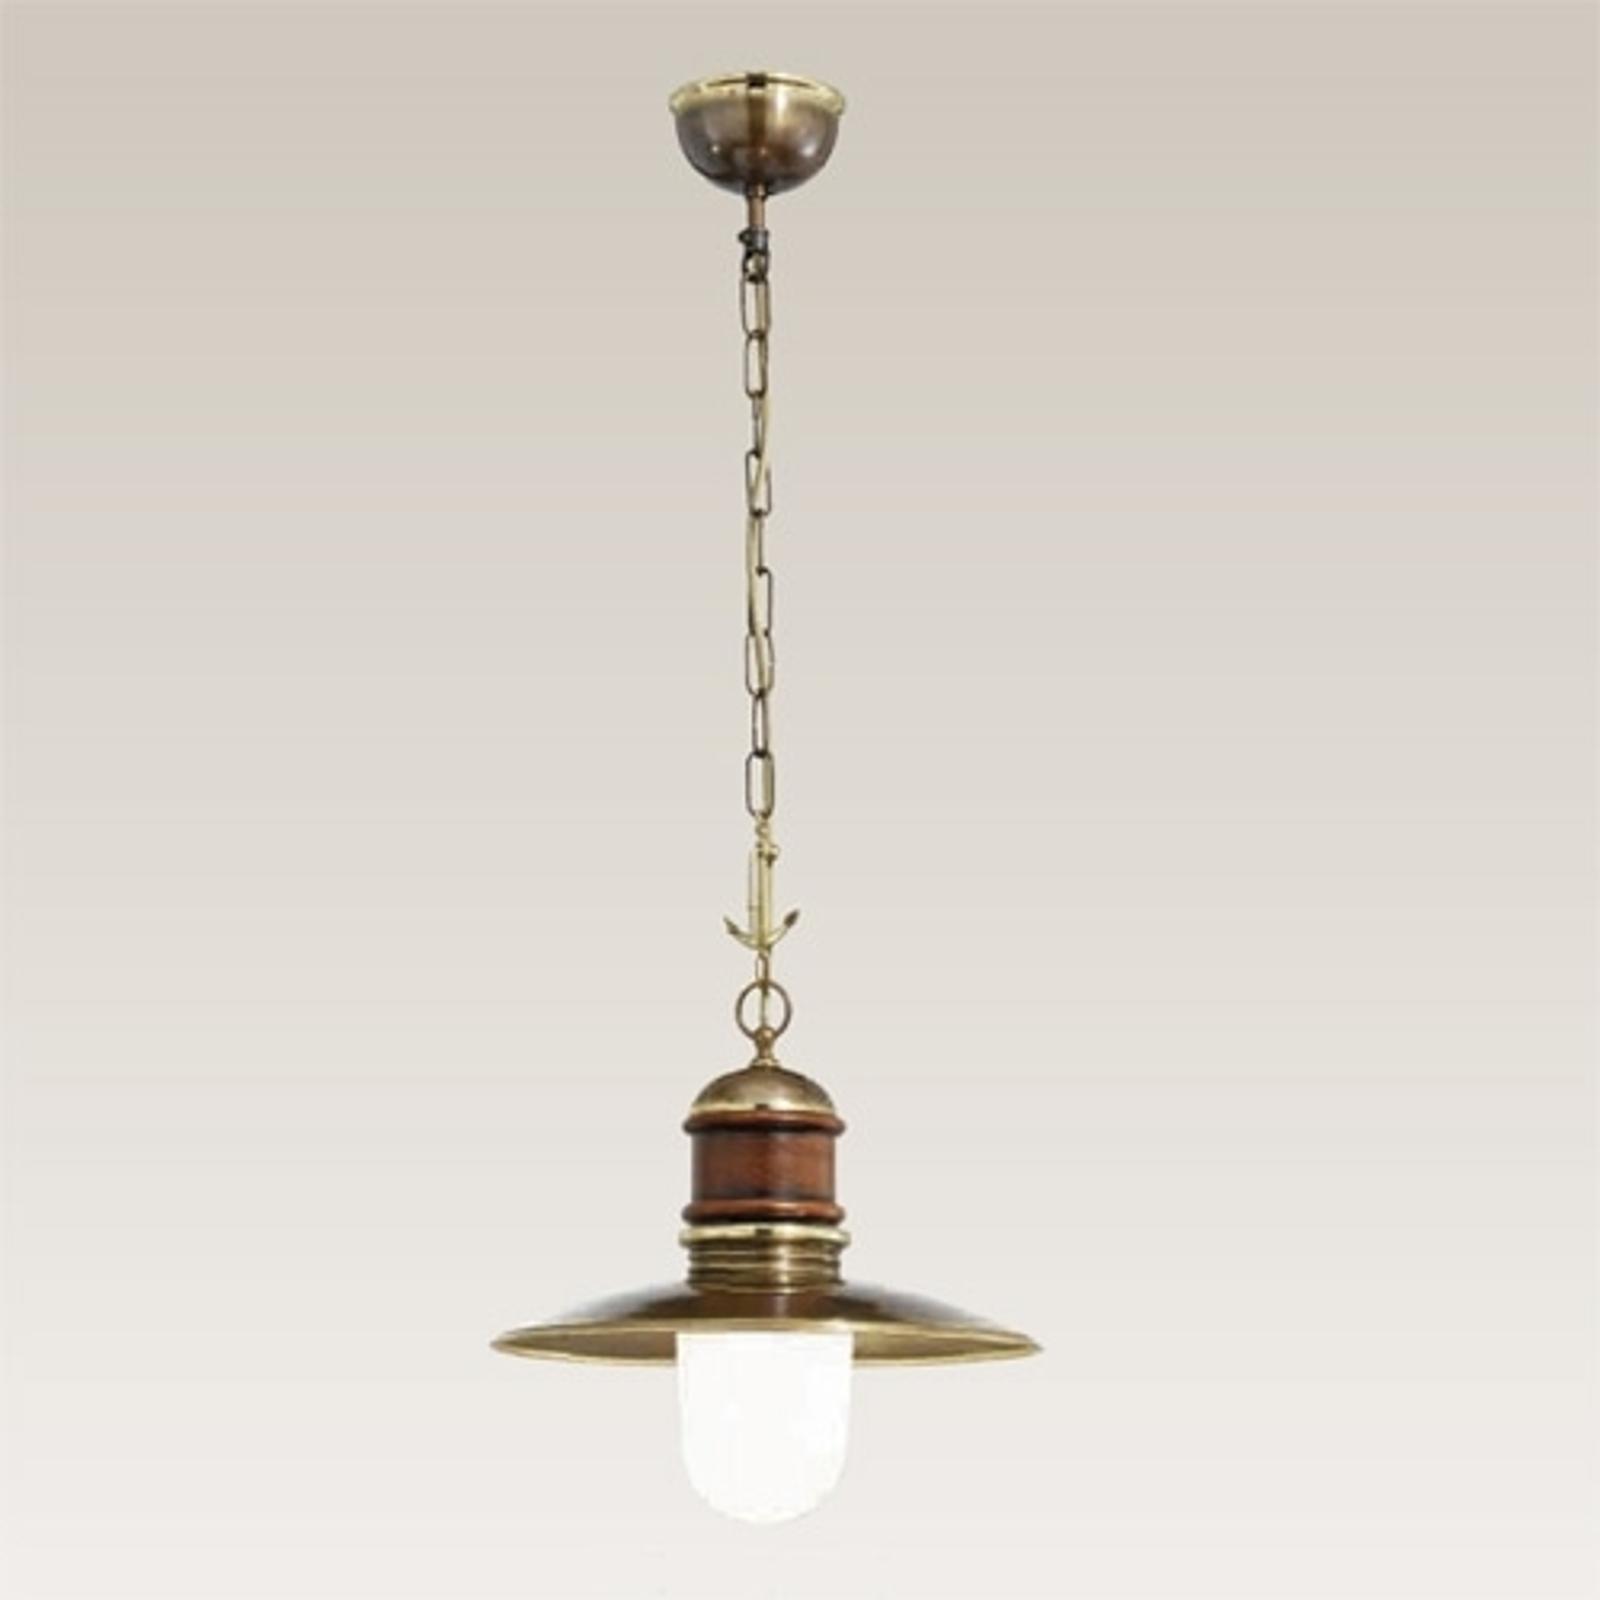 Faro pendellampe med ett lys på 31 cm